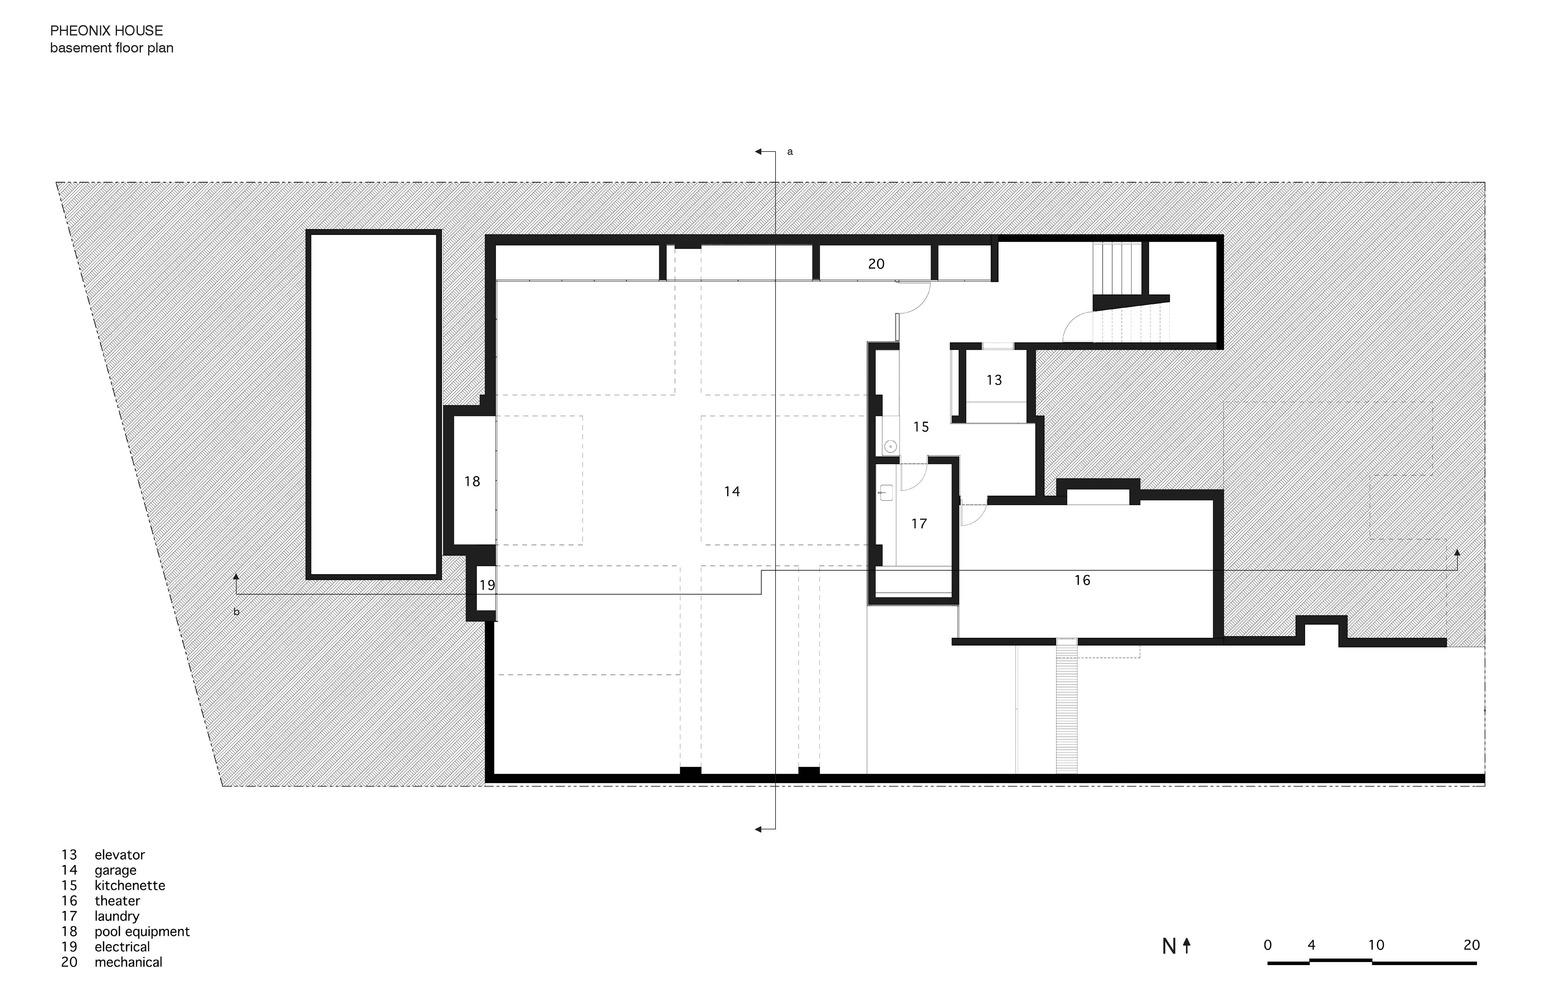 hight resolution of phoenix house sebastian mariscal studio basement plan